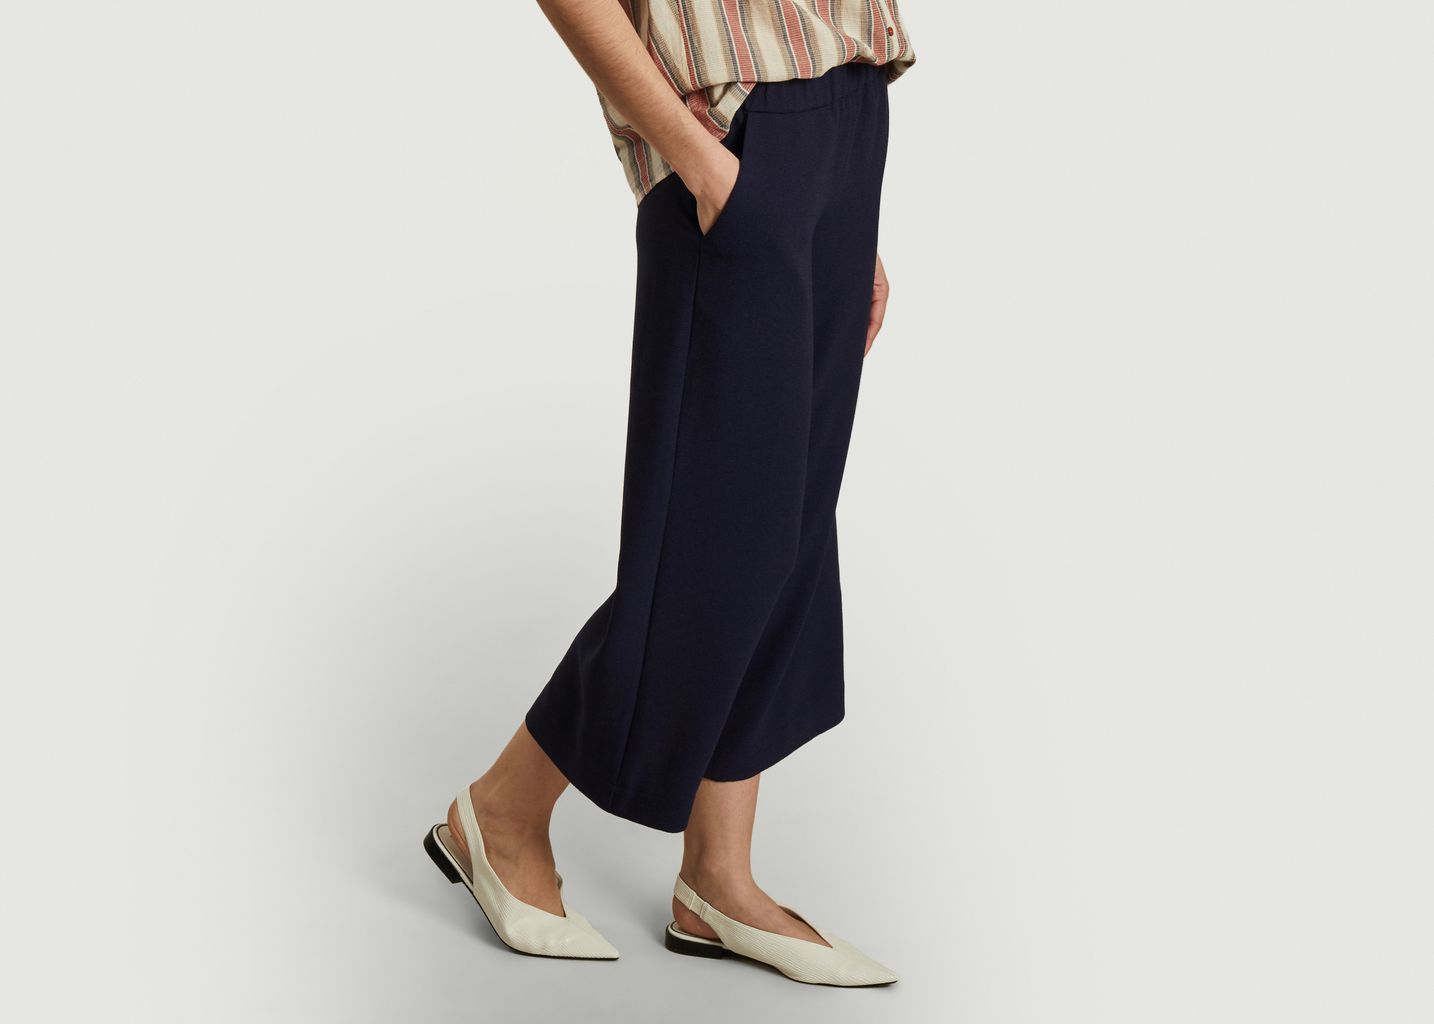 Pantalon Pako - Tinsels